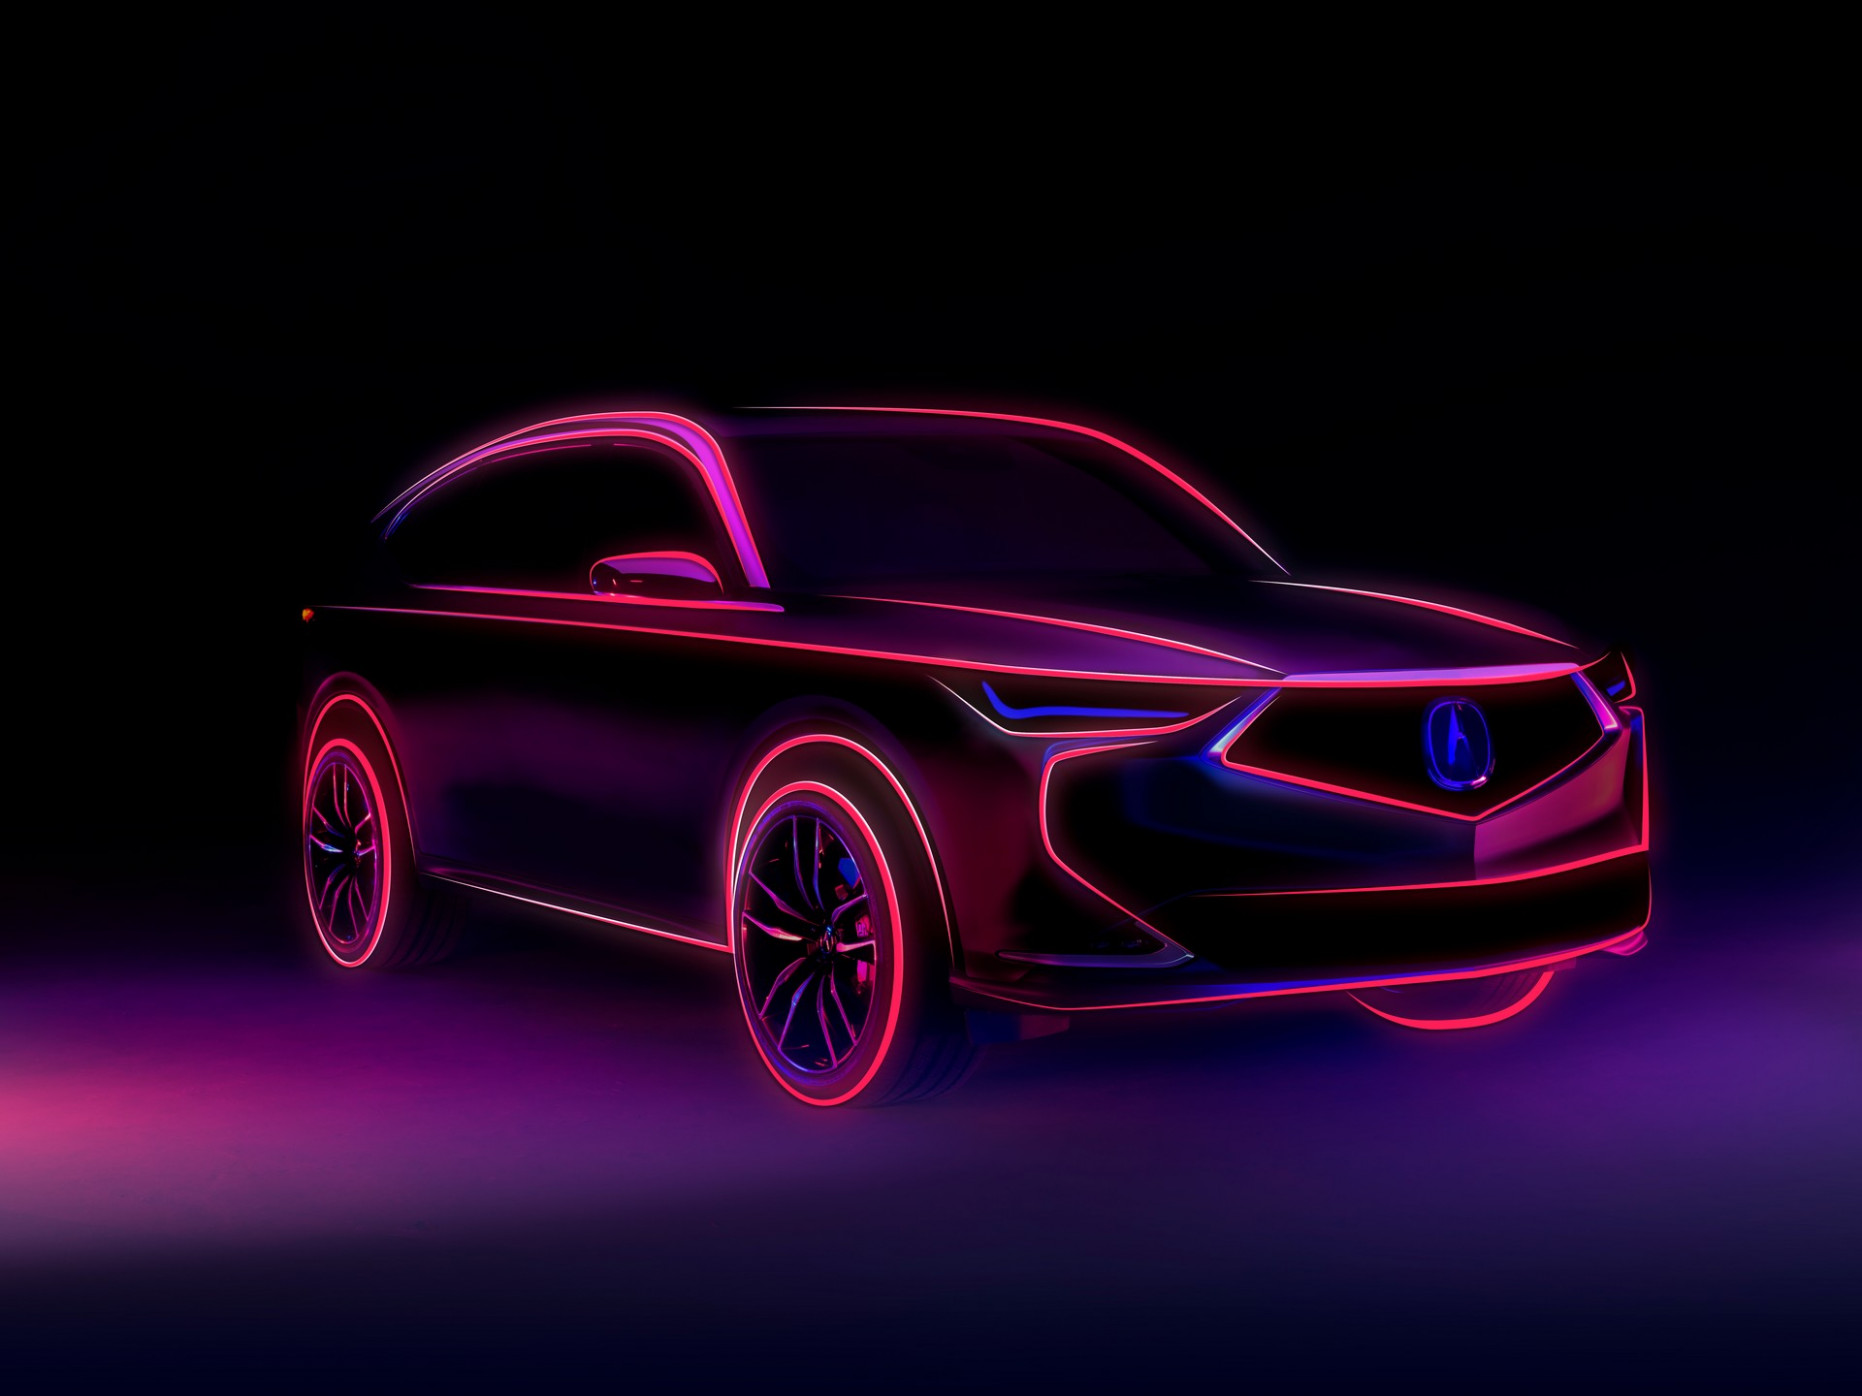 Performance 2022 Acura RLX